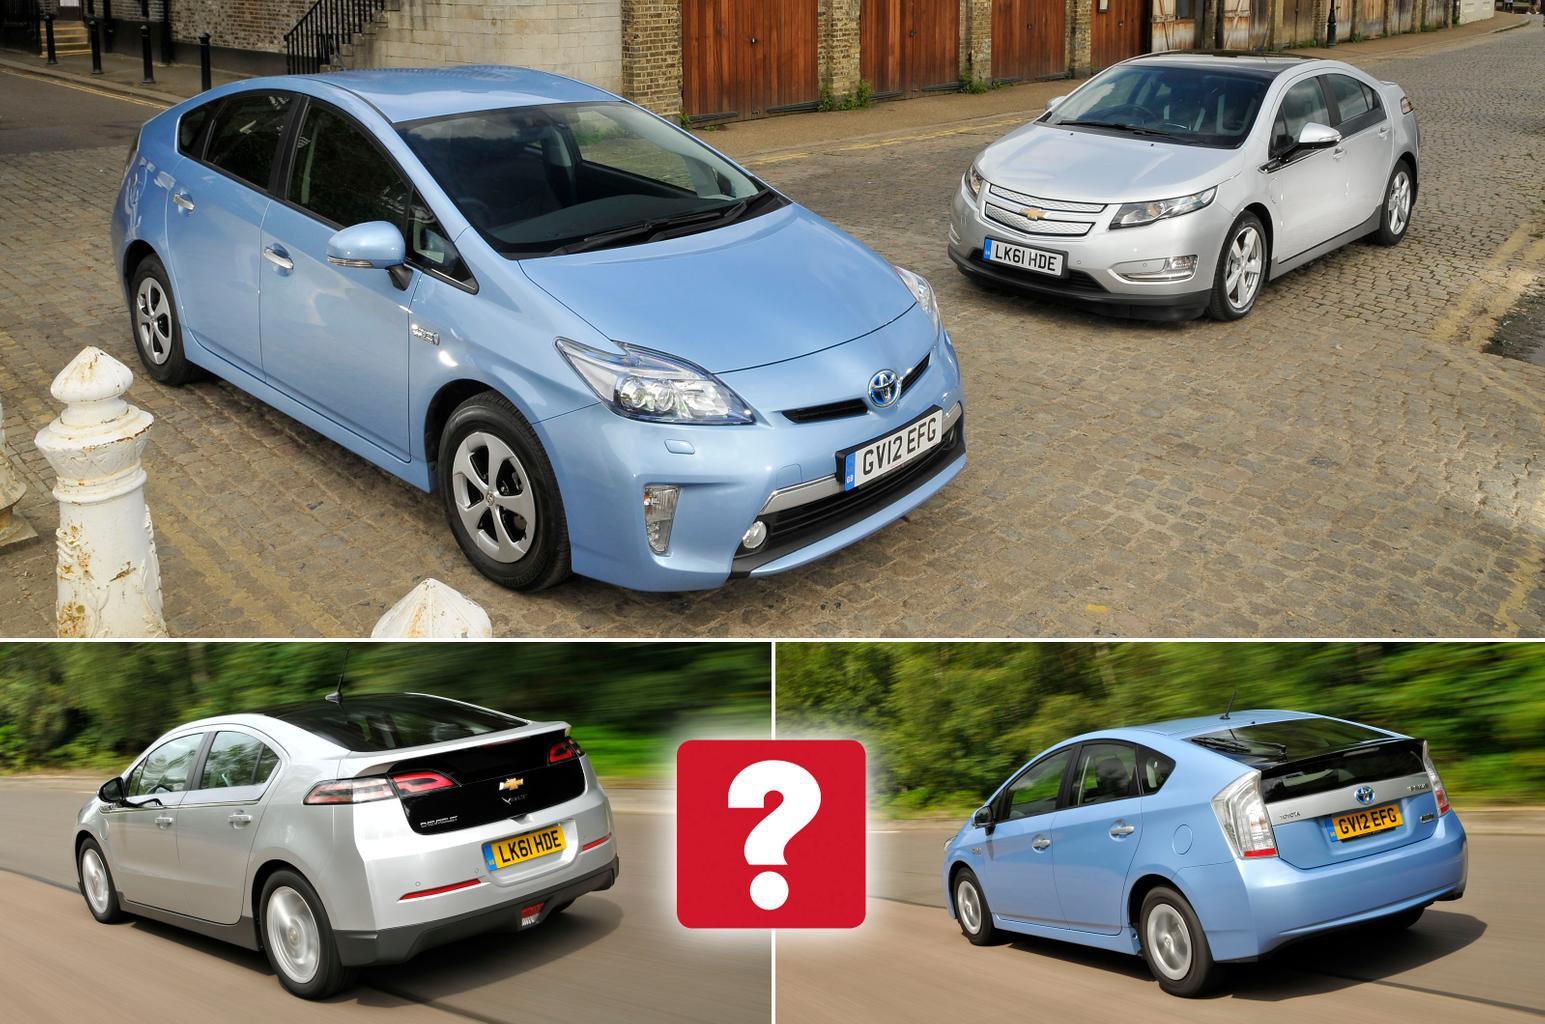 Used Toyota Prius vs Chevrolet Volt